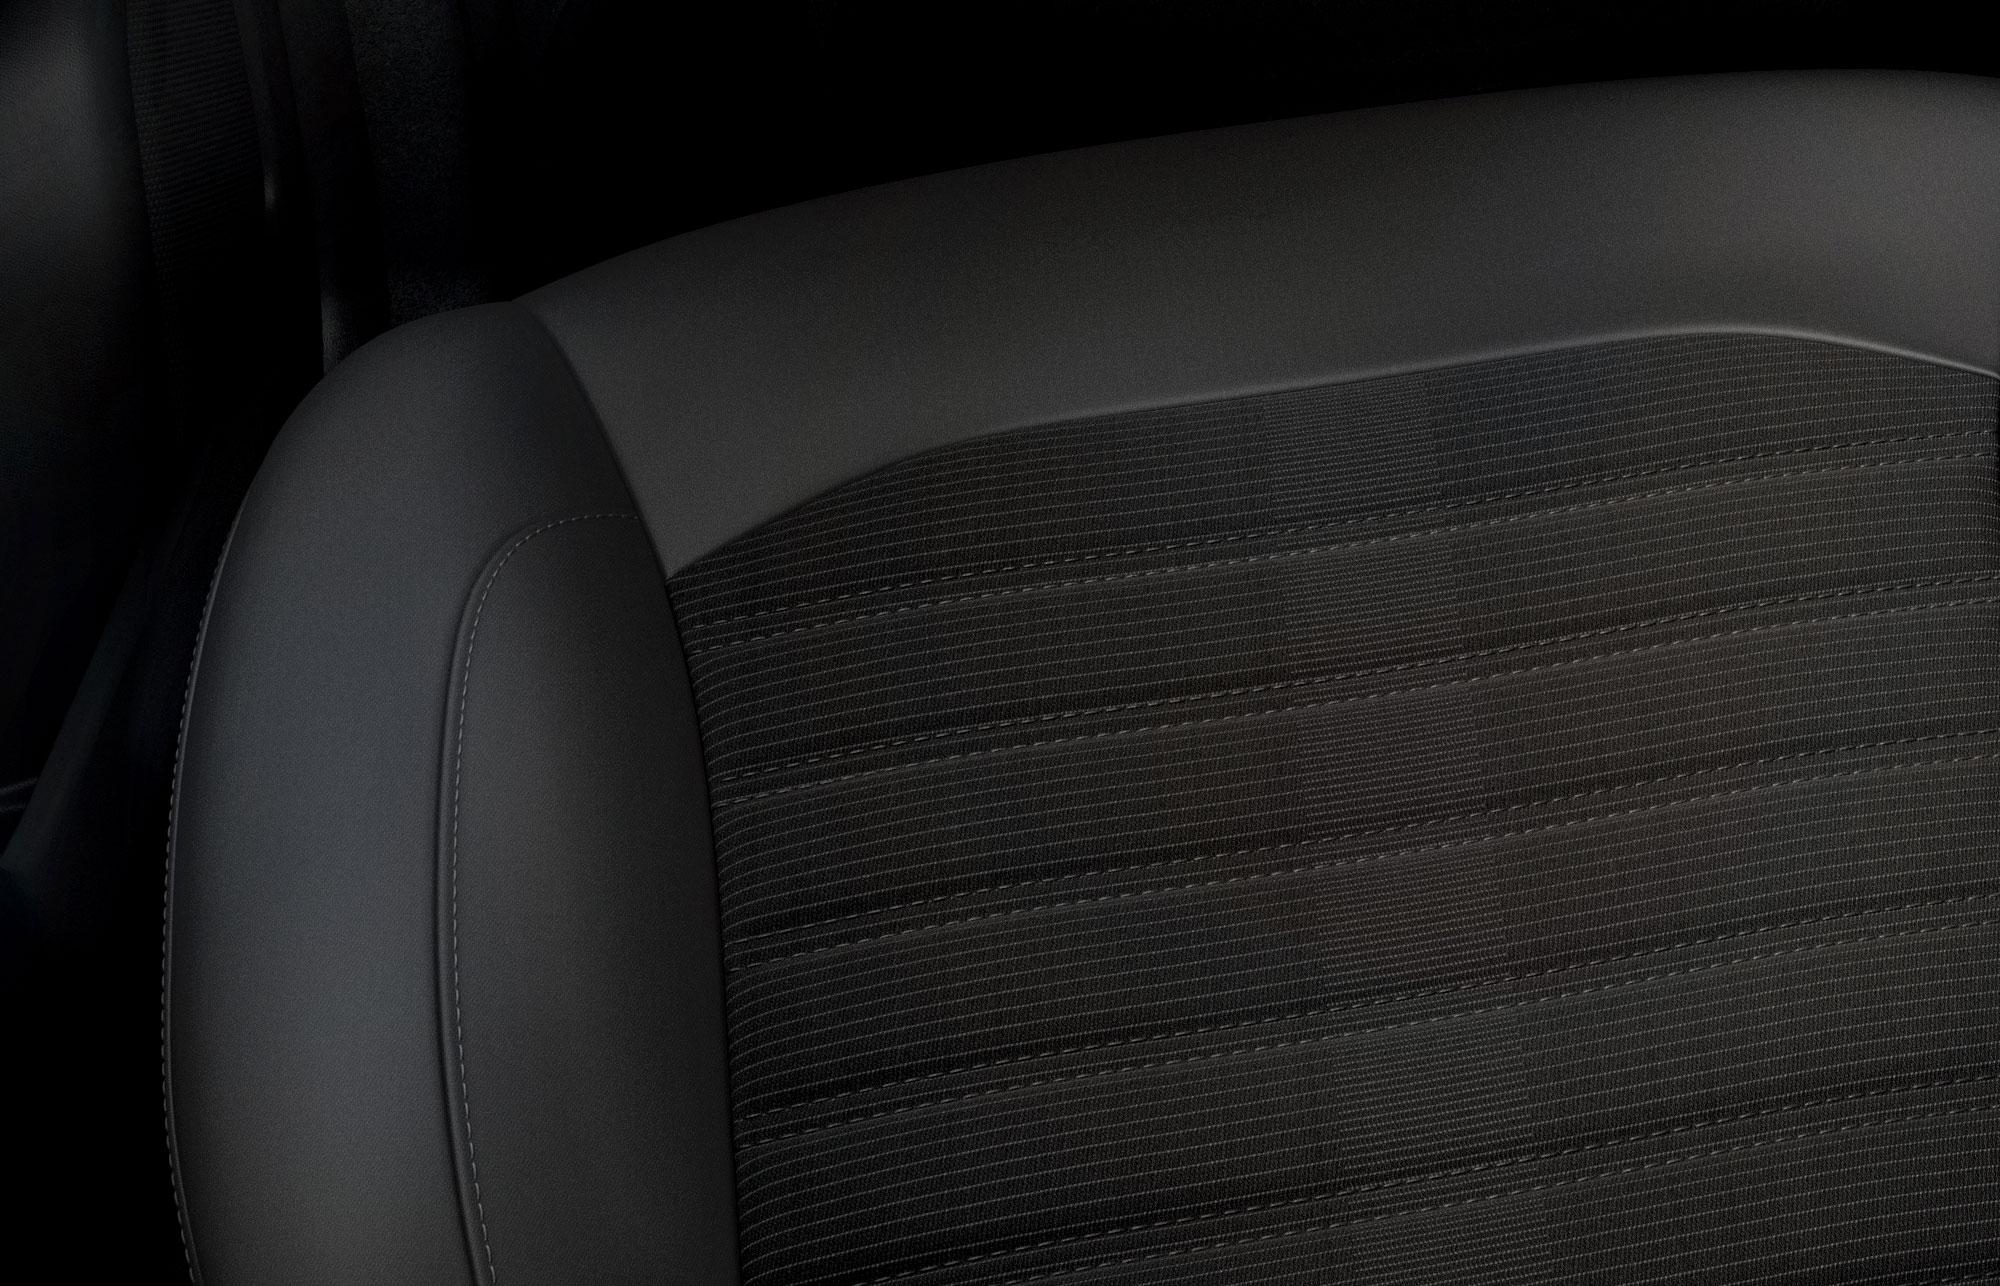 Ford Galaxy interiør 2